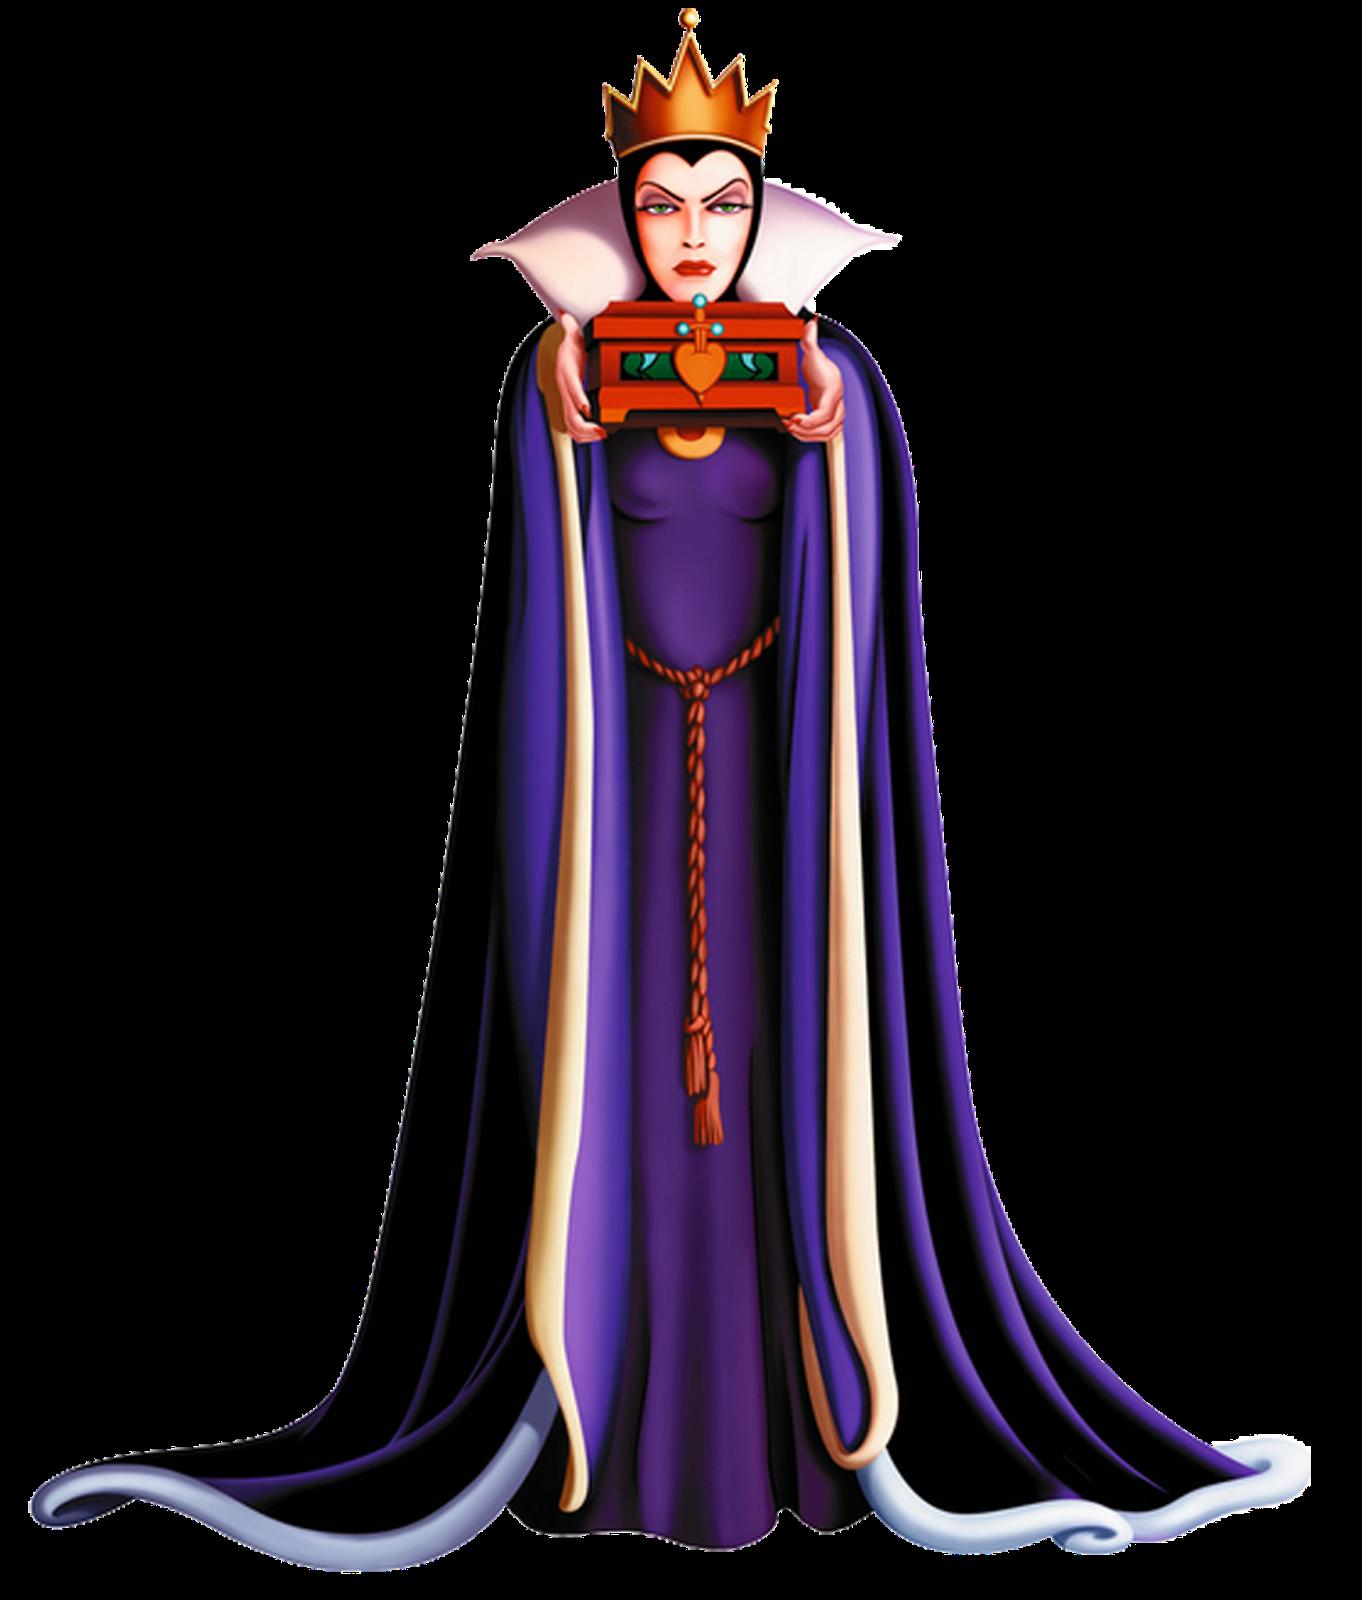 AuthorQuest: Analyzing the Disney Villains: The Evil Queen ...